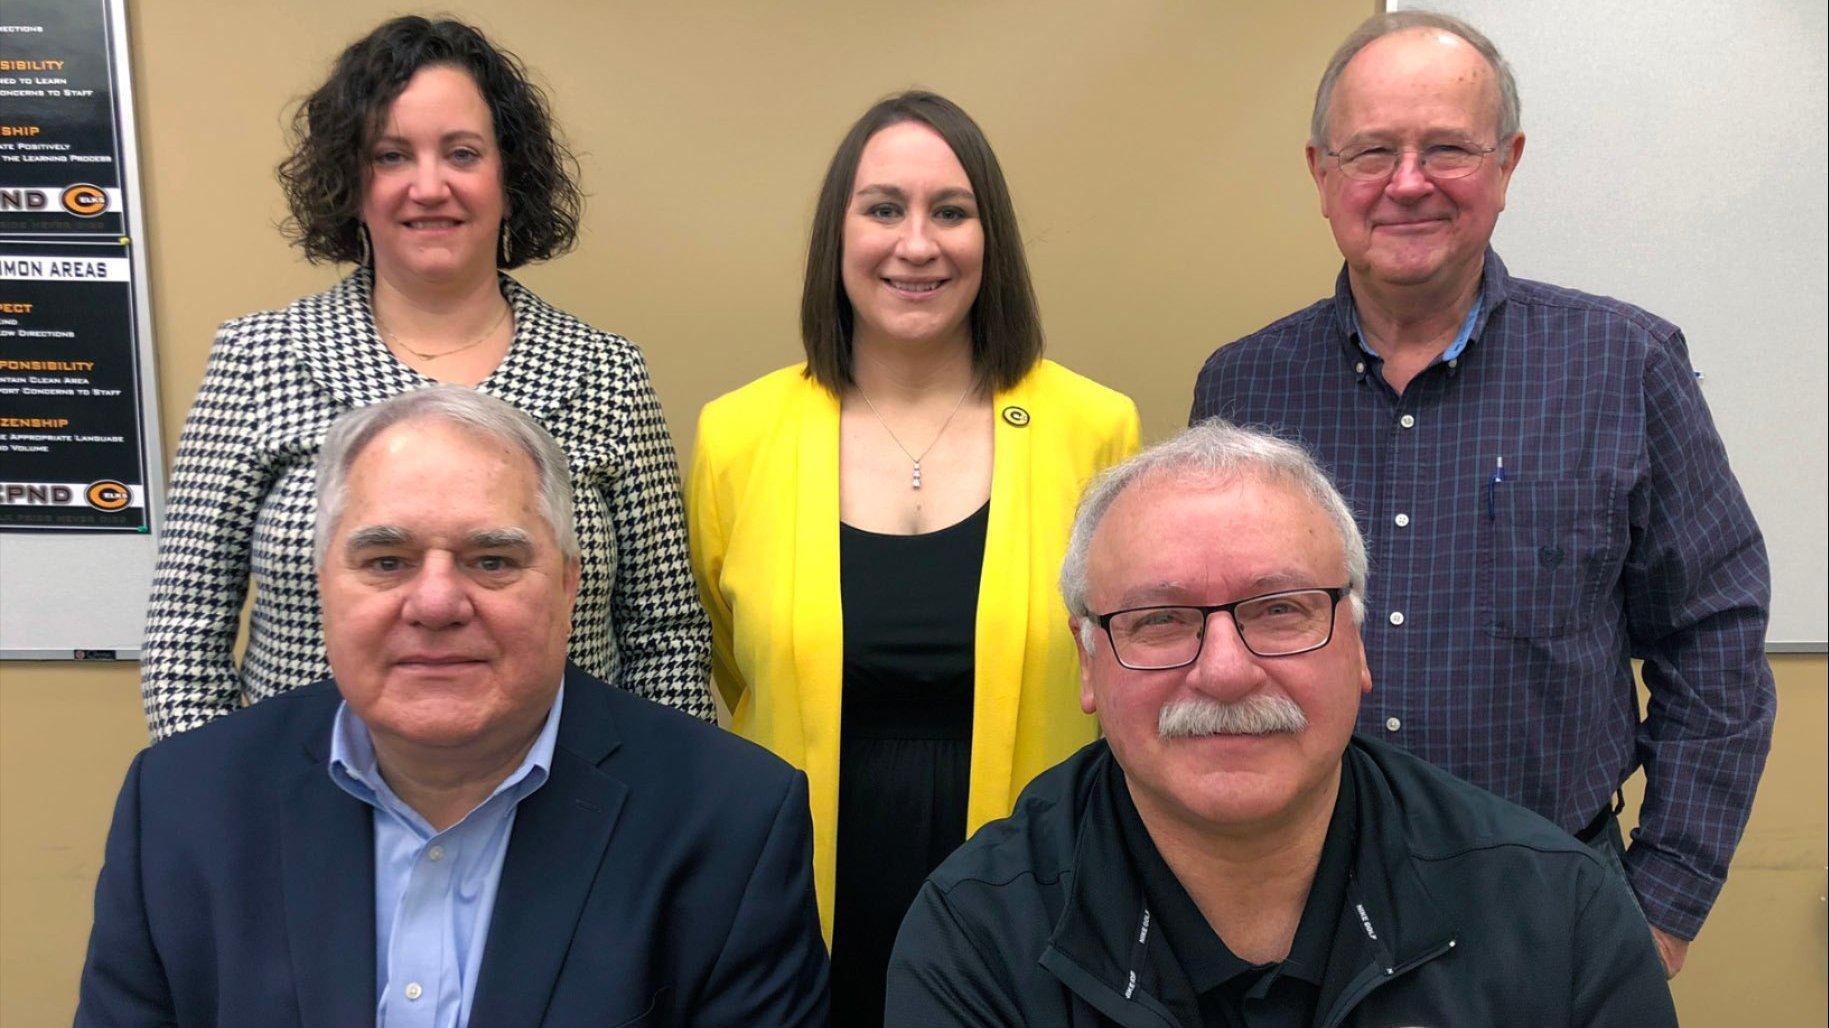 Image of five school board members